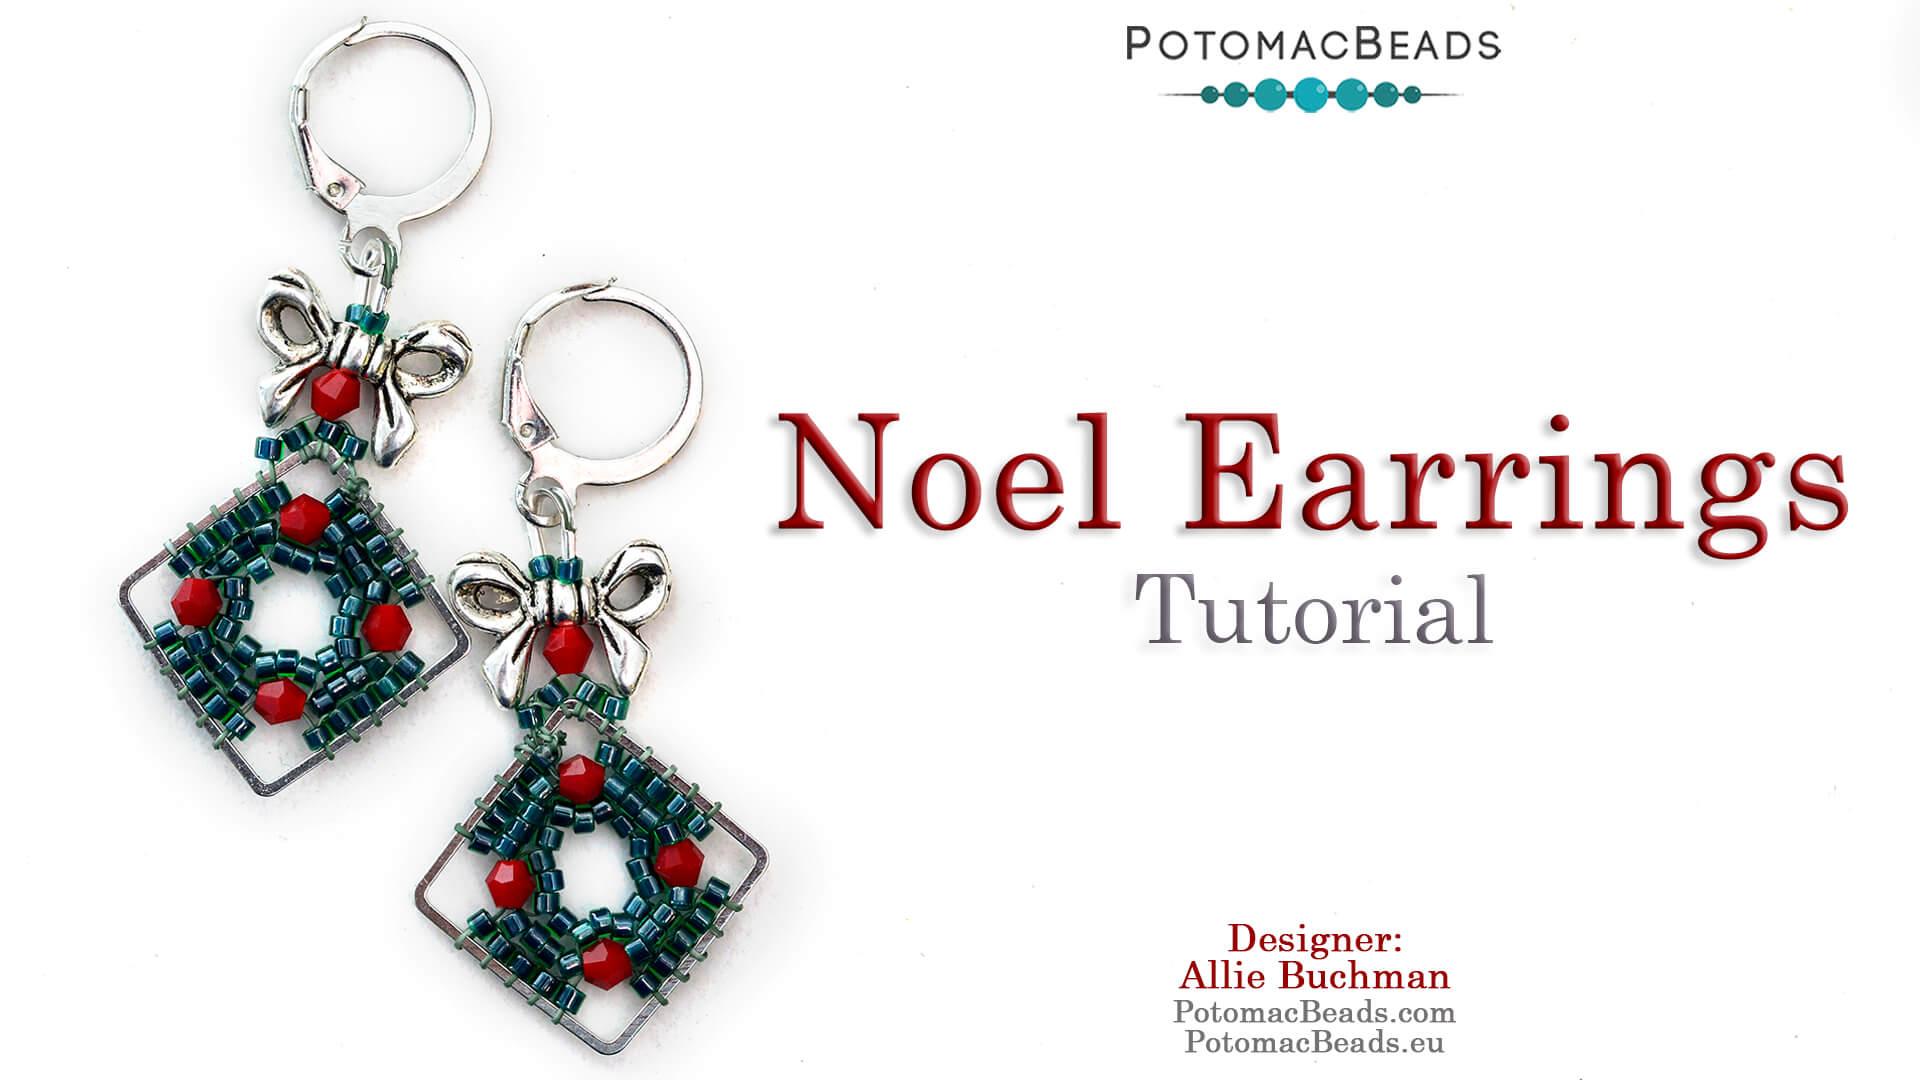 How to Bead Jewelry / Videos Sorted by Beads / Potomac Crystal Videos / Noel Earrings Tutorial